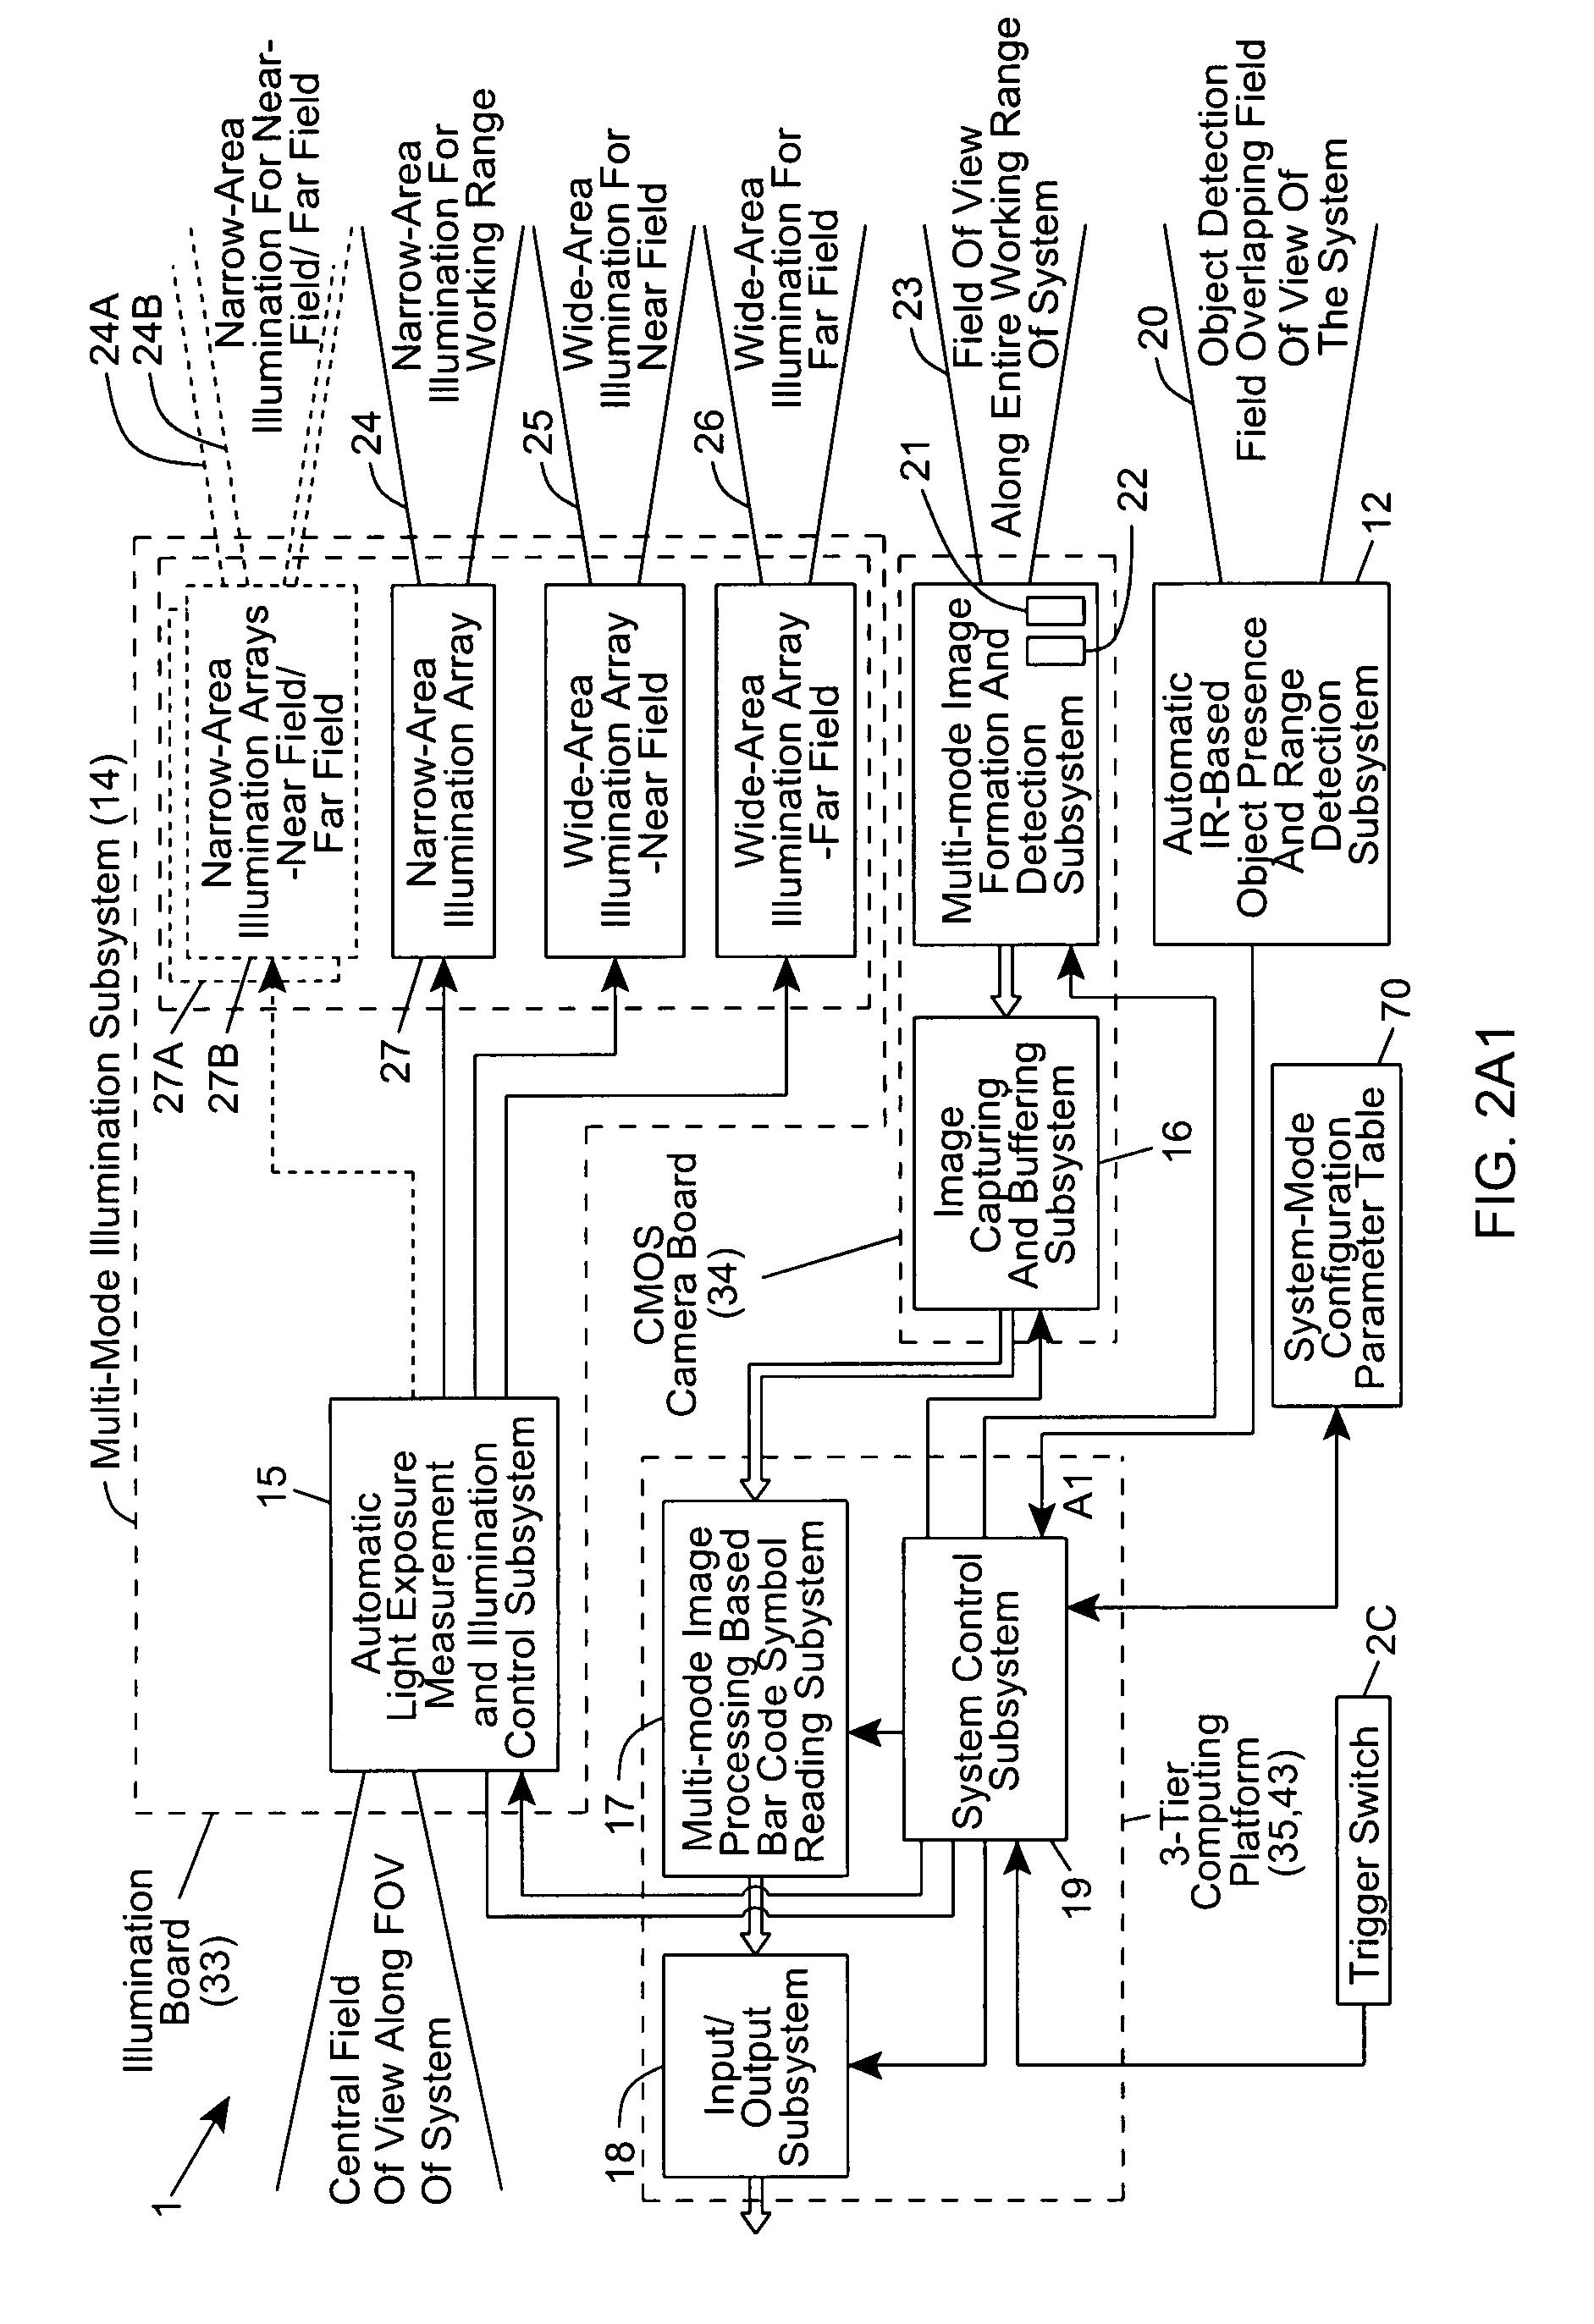 Patent Us 7712666 B2 Leddriven Led Display Circuit Design Powersupplycircuit Images